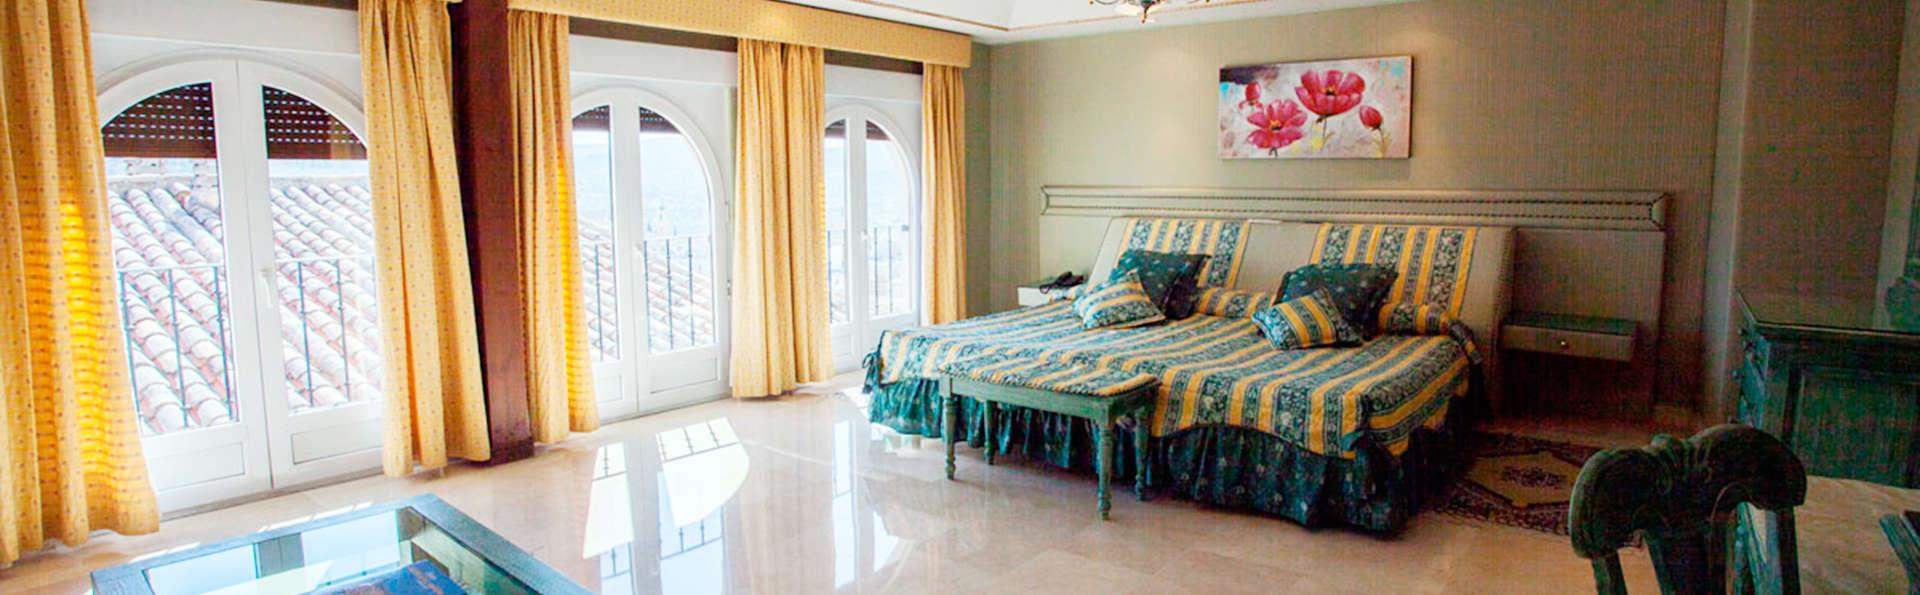 Hotel Sercotel Alfonso VI - EDIT_room3.jpg